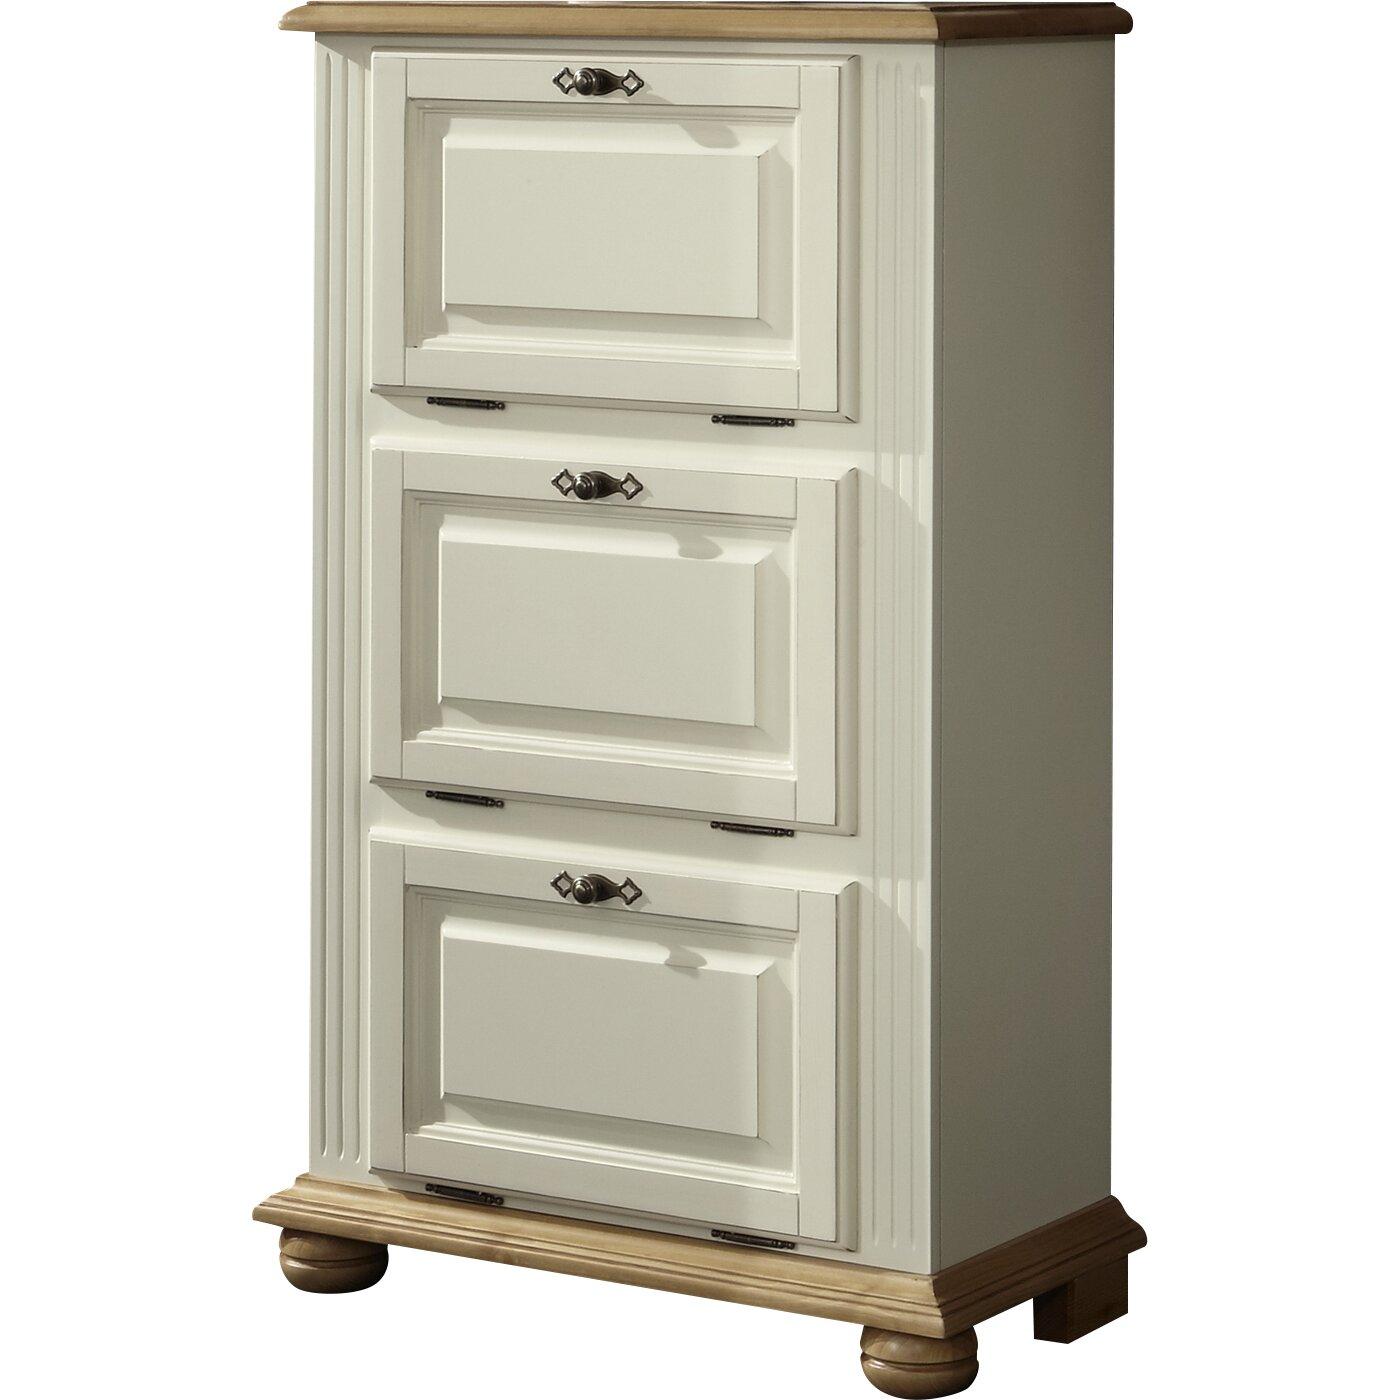 caracella lychee shoe cabinet reviews wayfair uk. Black Bedroom Furniture Sets. Home Design Ideas